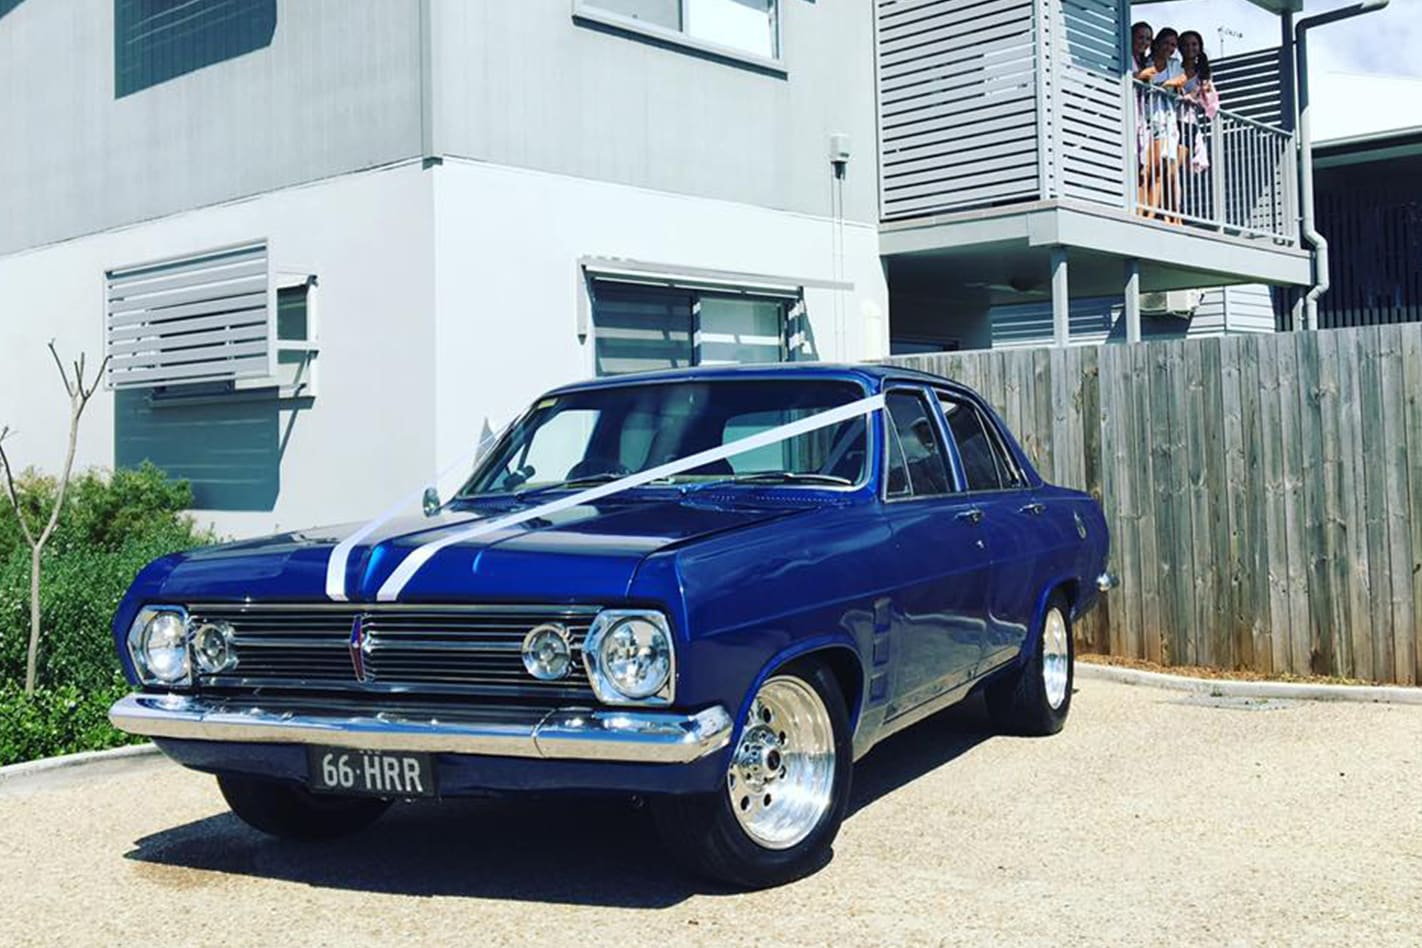 Rossy Benjamin's Holden wedding car